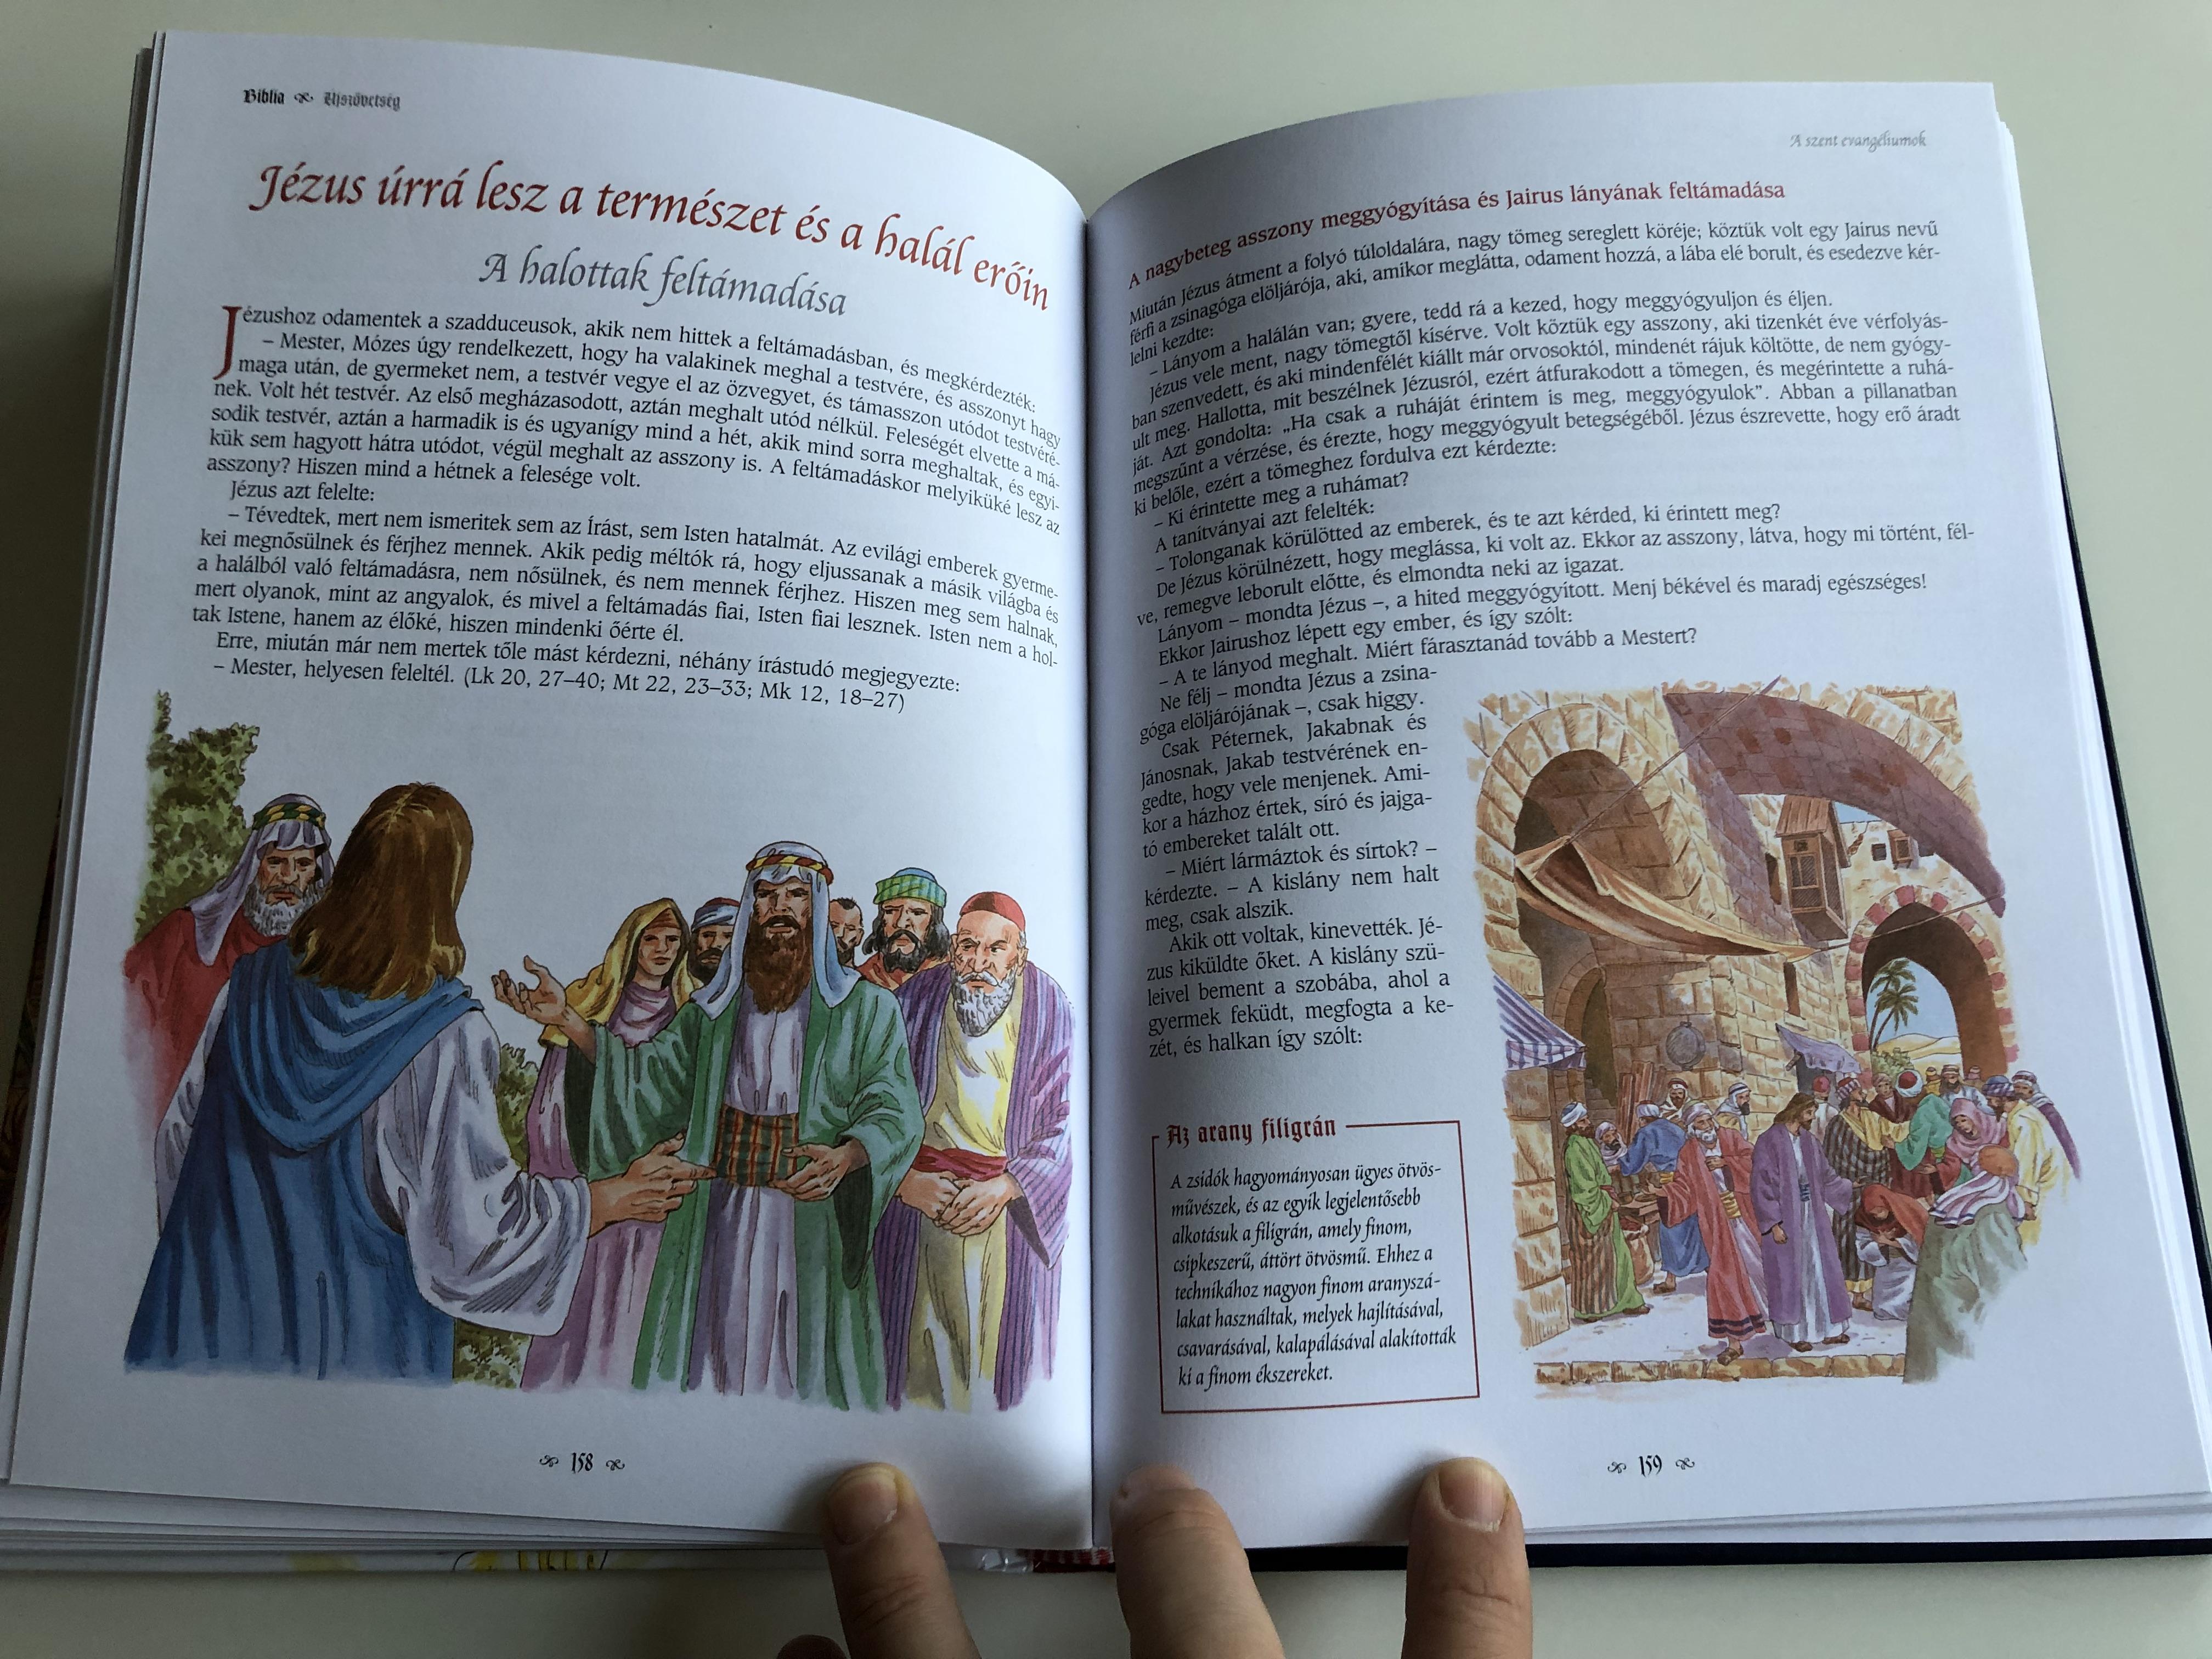 biblia-gyermekeknek-hungarian-bible-for-children-editor-campos-jim-nez-m-ria-hardcover-2010-napraforg-kiad-7-.jpg